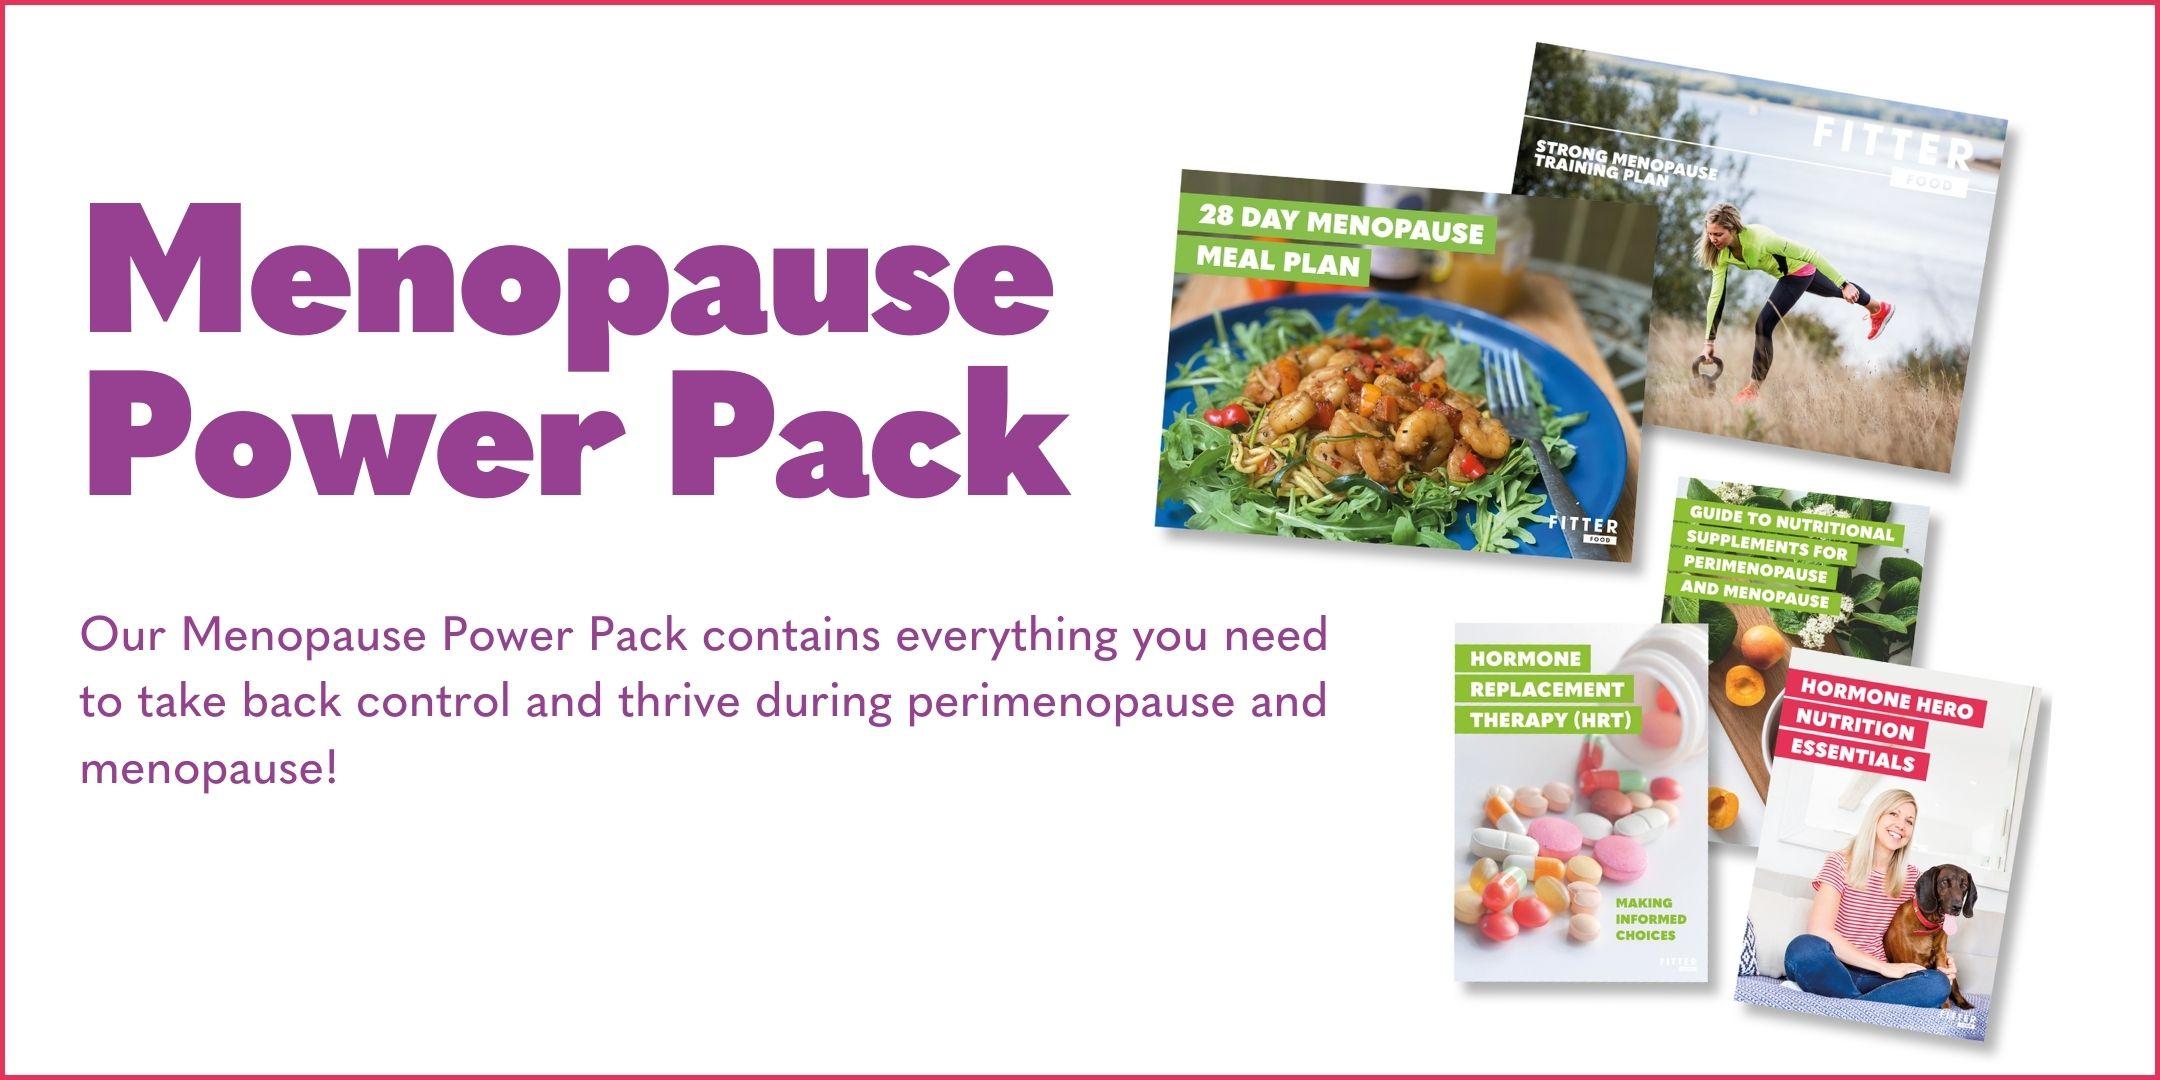 Menopause Power Pack Promo Image